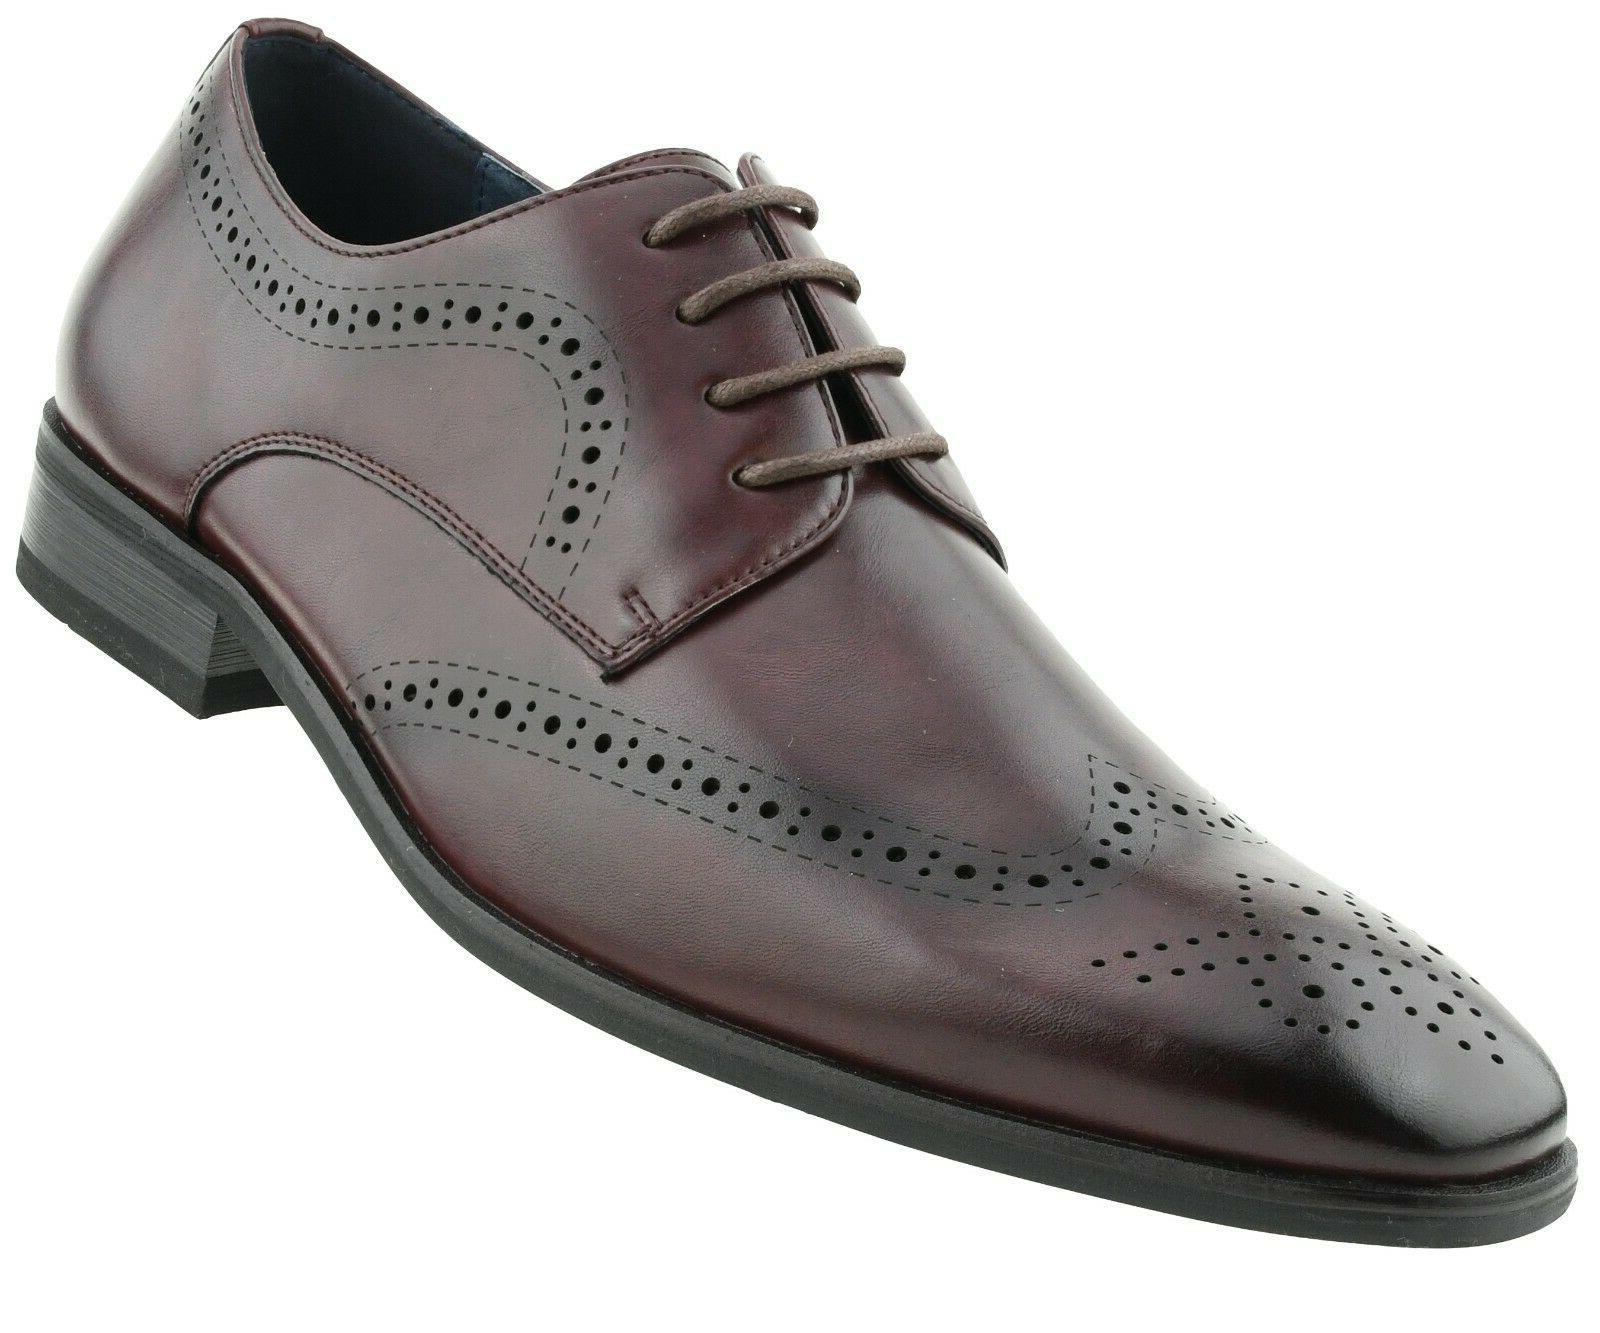 Amali Oxford Lace Up Shoes